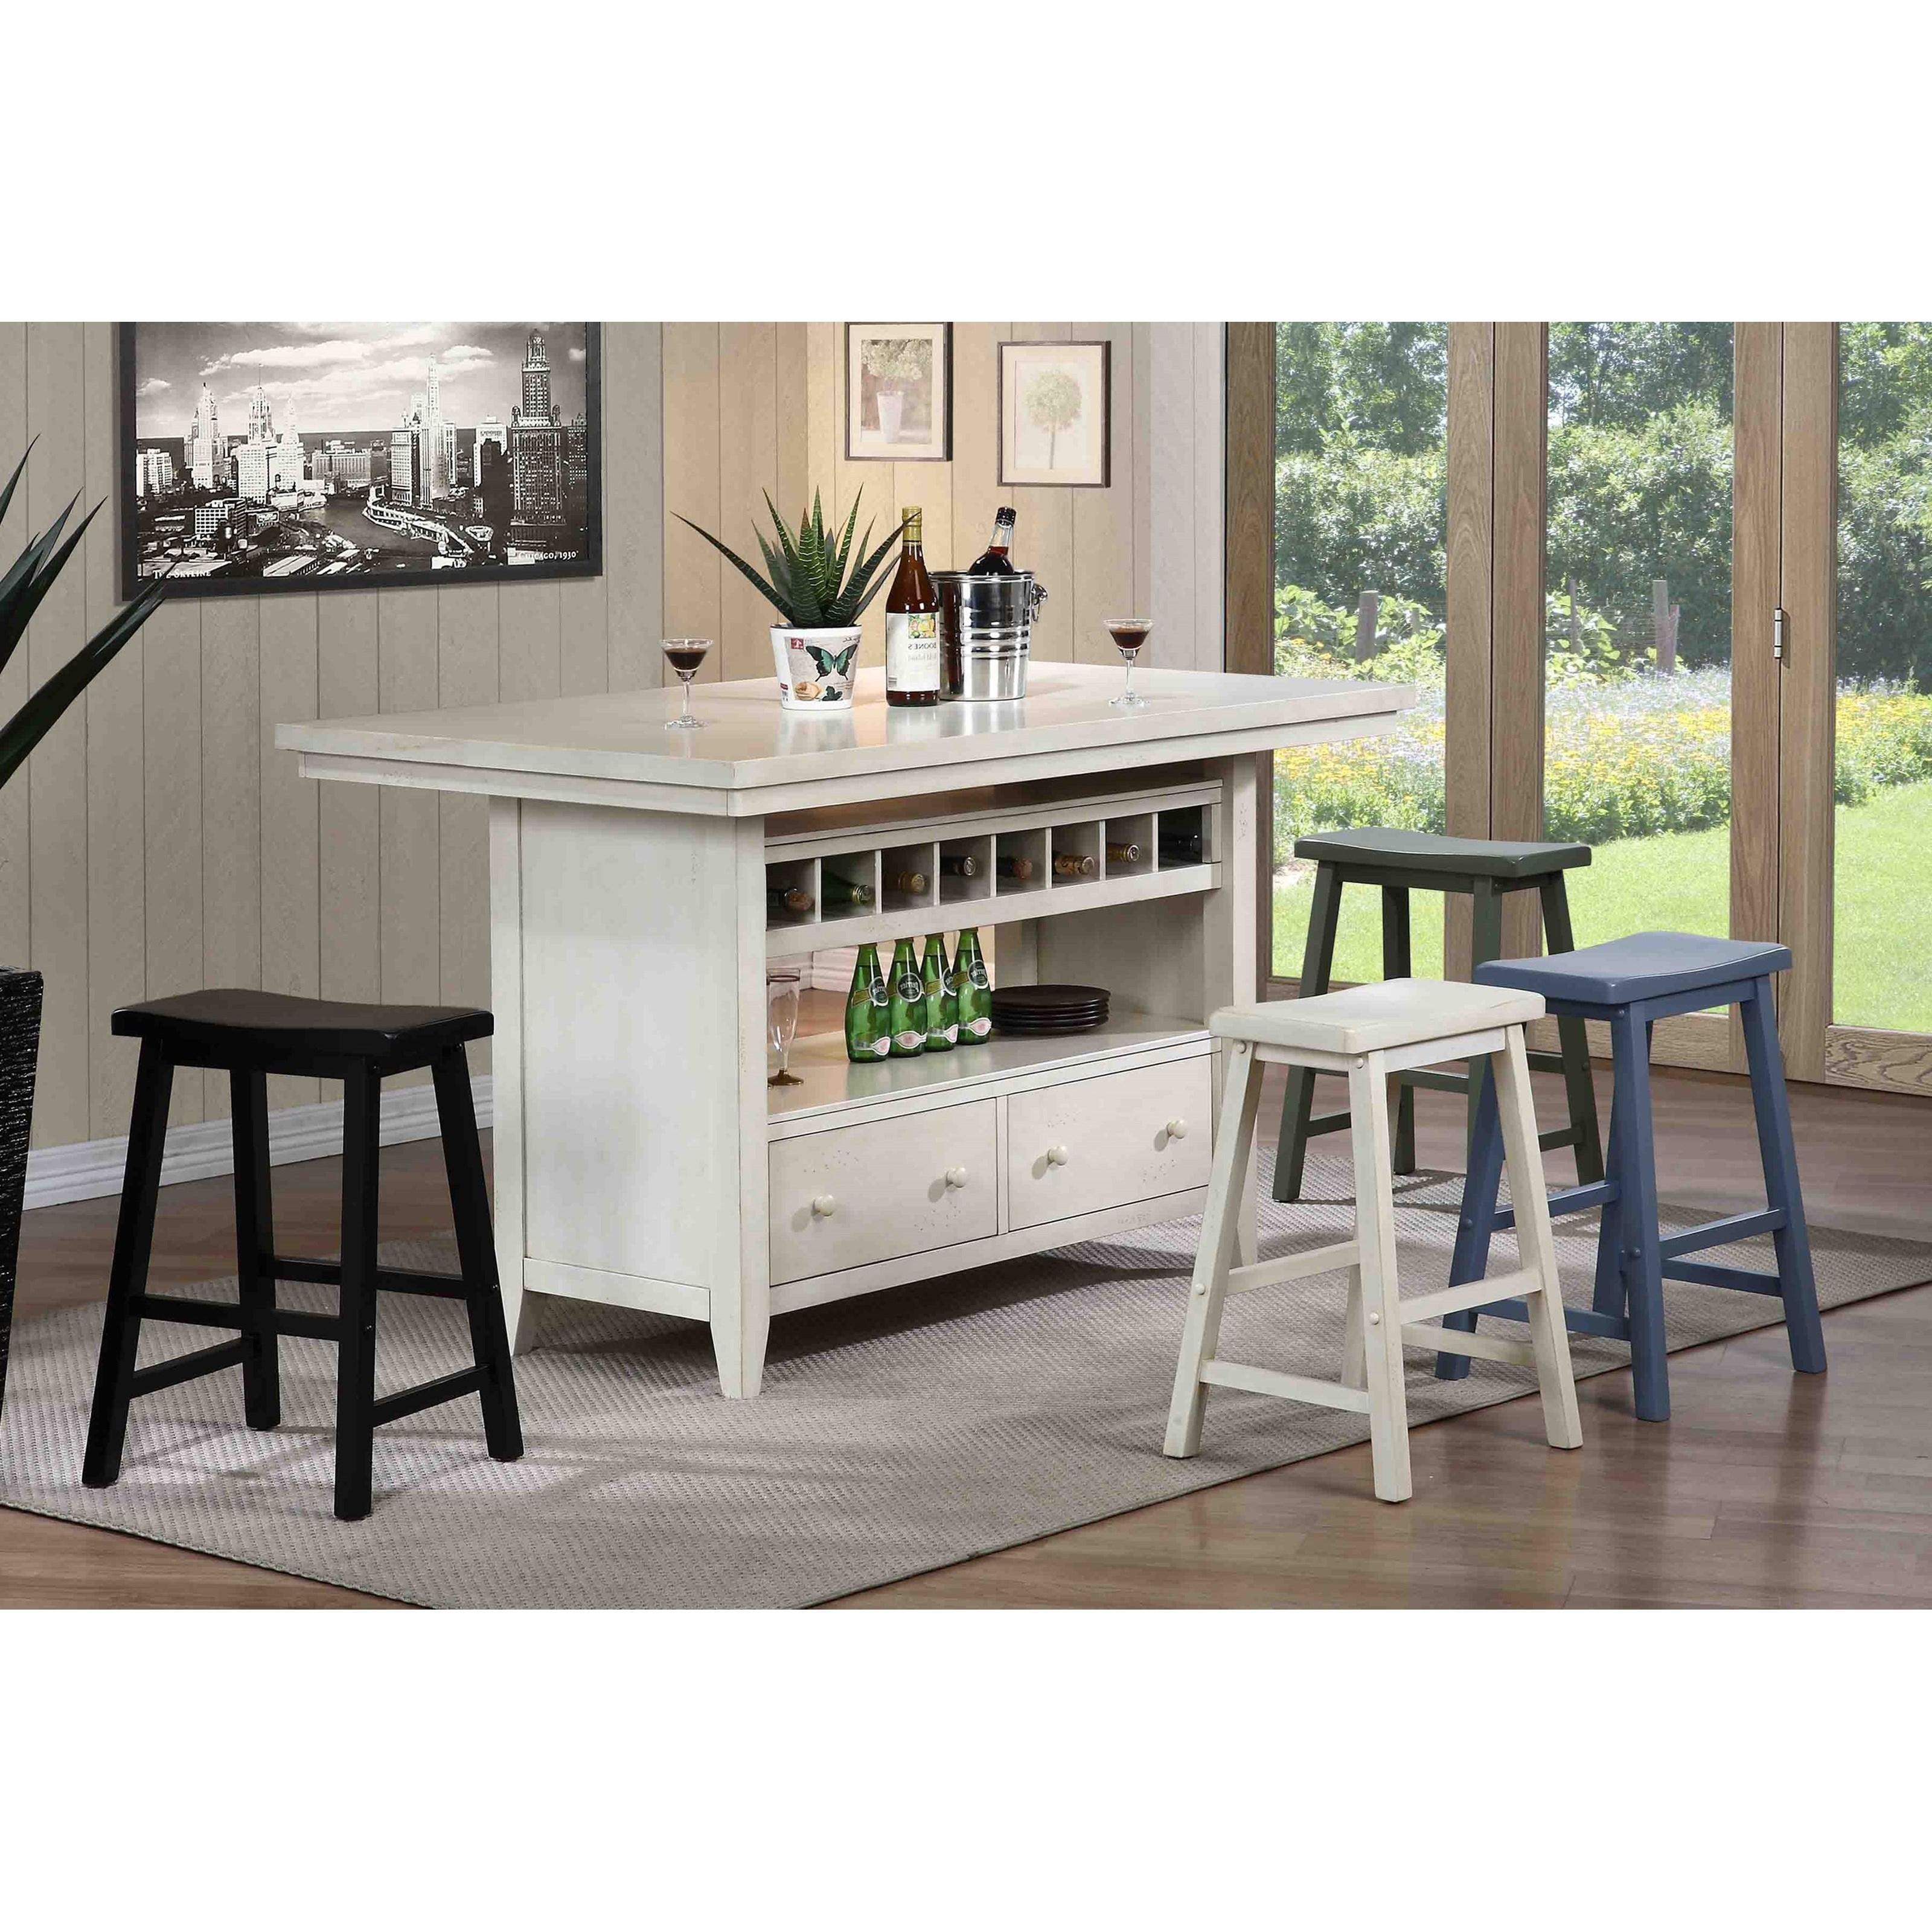 Kitchen Island Furniture: E.C.I. Furniture Dining Four Seasons Dining Island